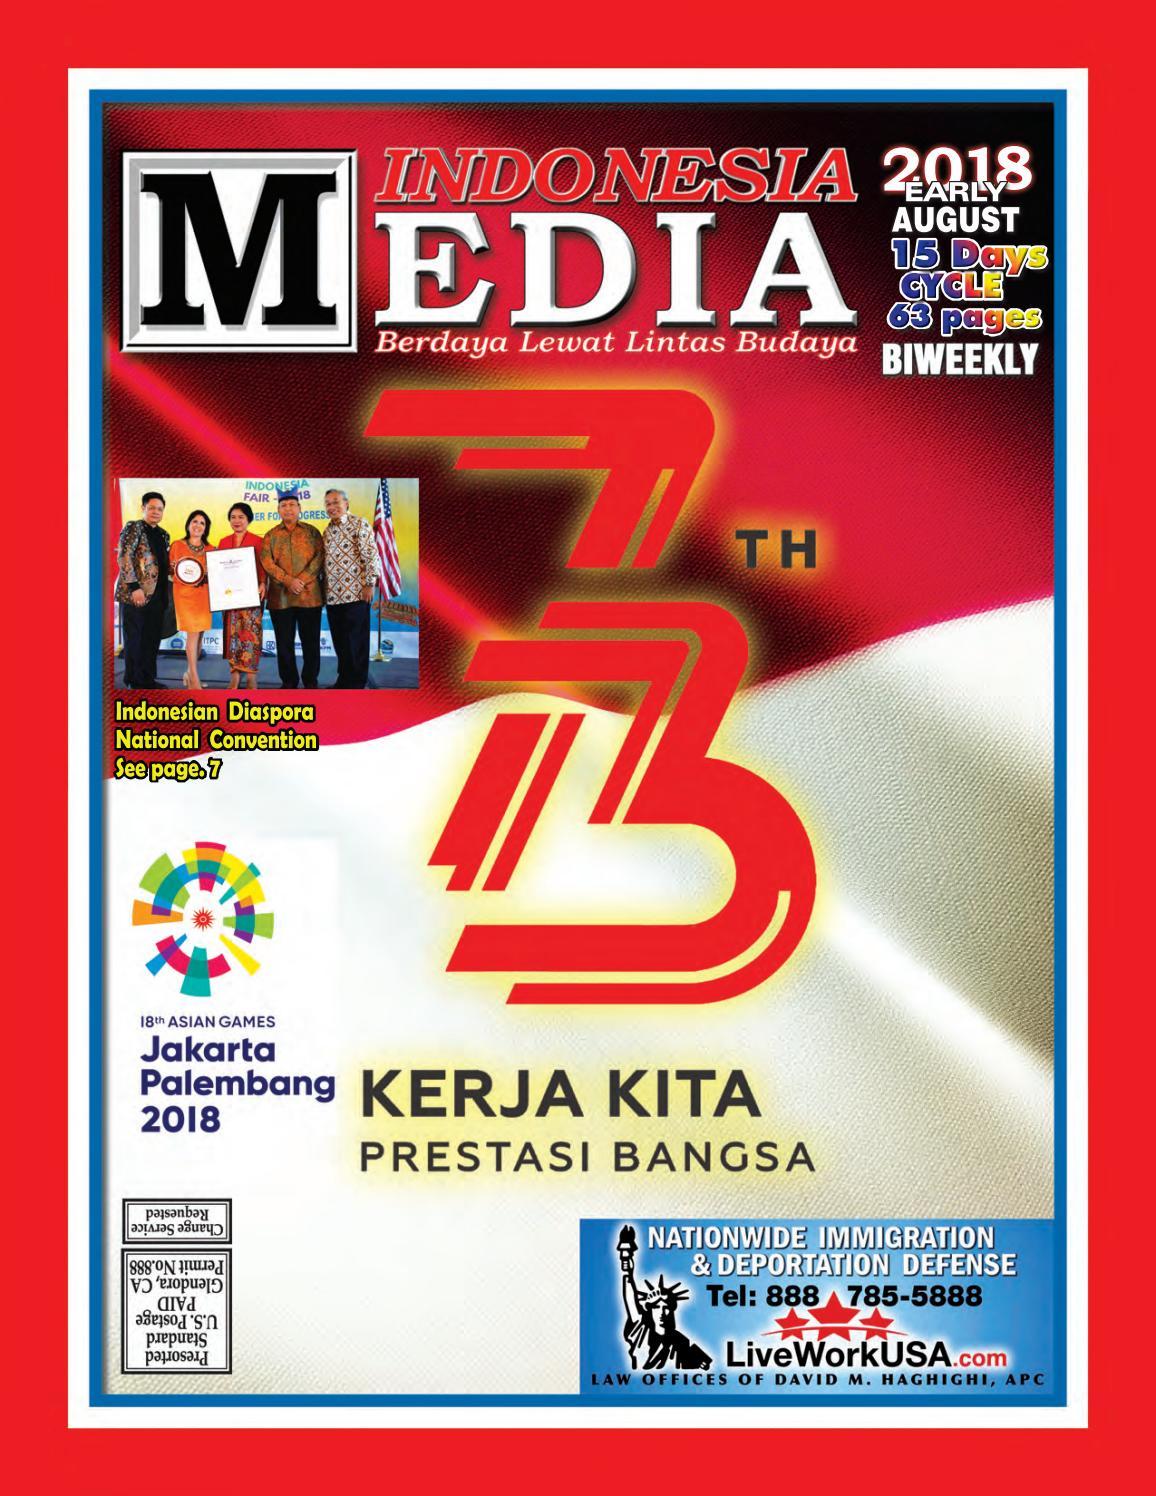 Indonesia Media Issue Early August 2018 By Issuu Produk Ukm Bumn Batik Lengan Panjang Parang Toko Ngremboko